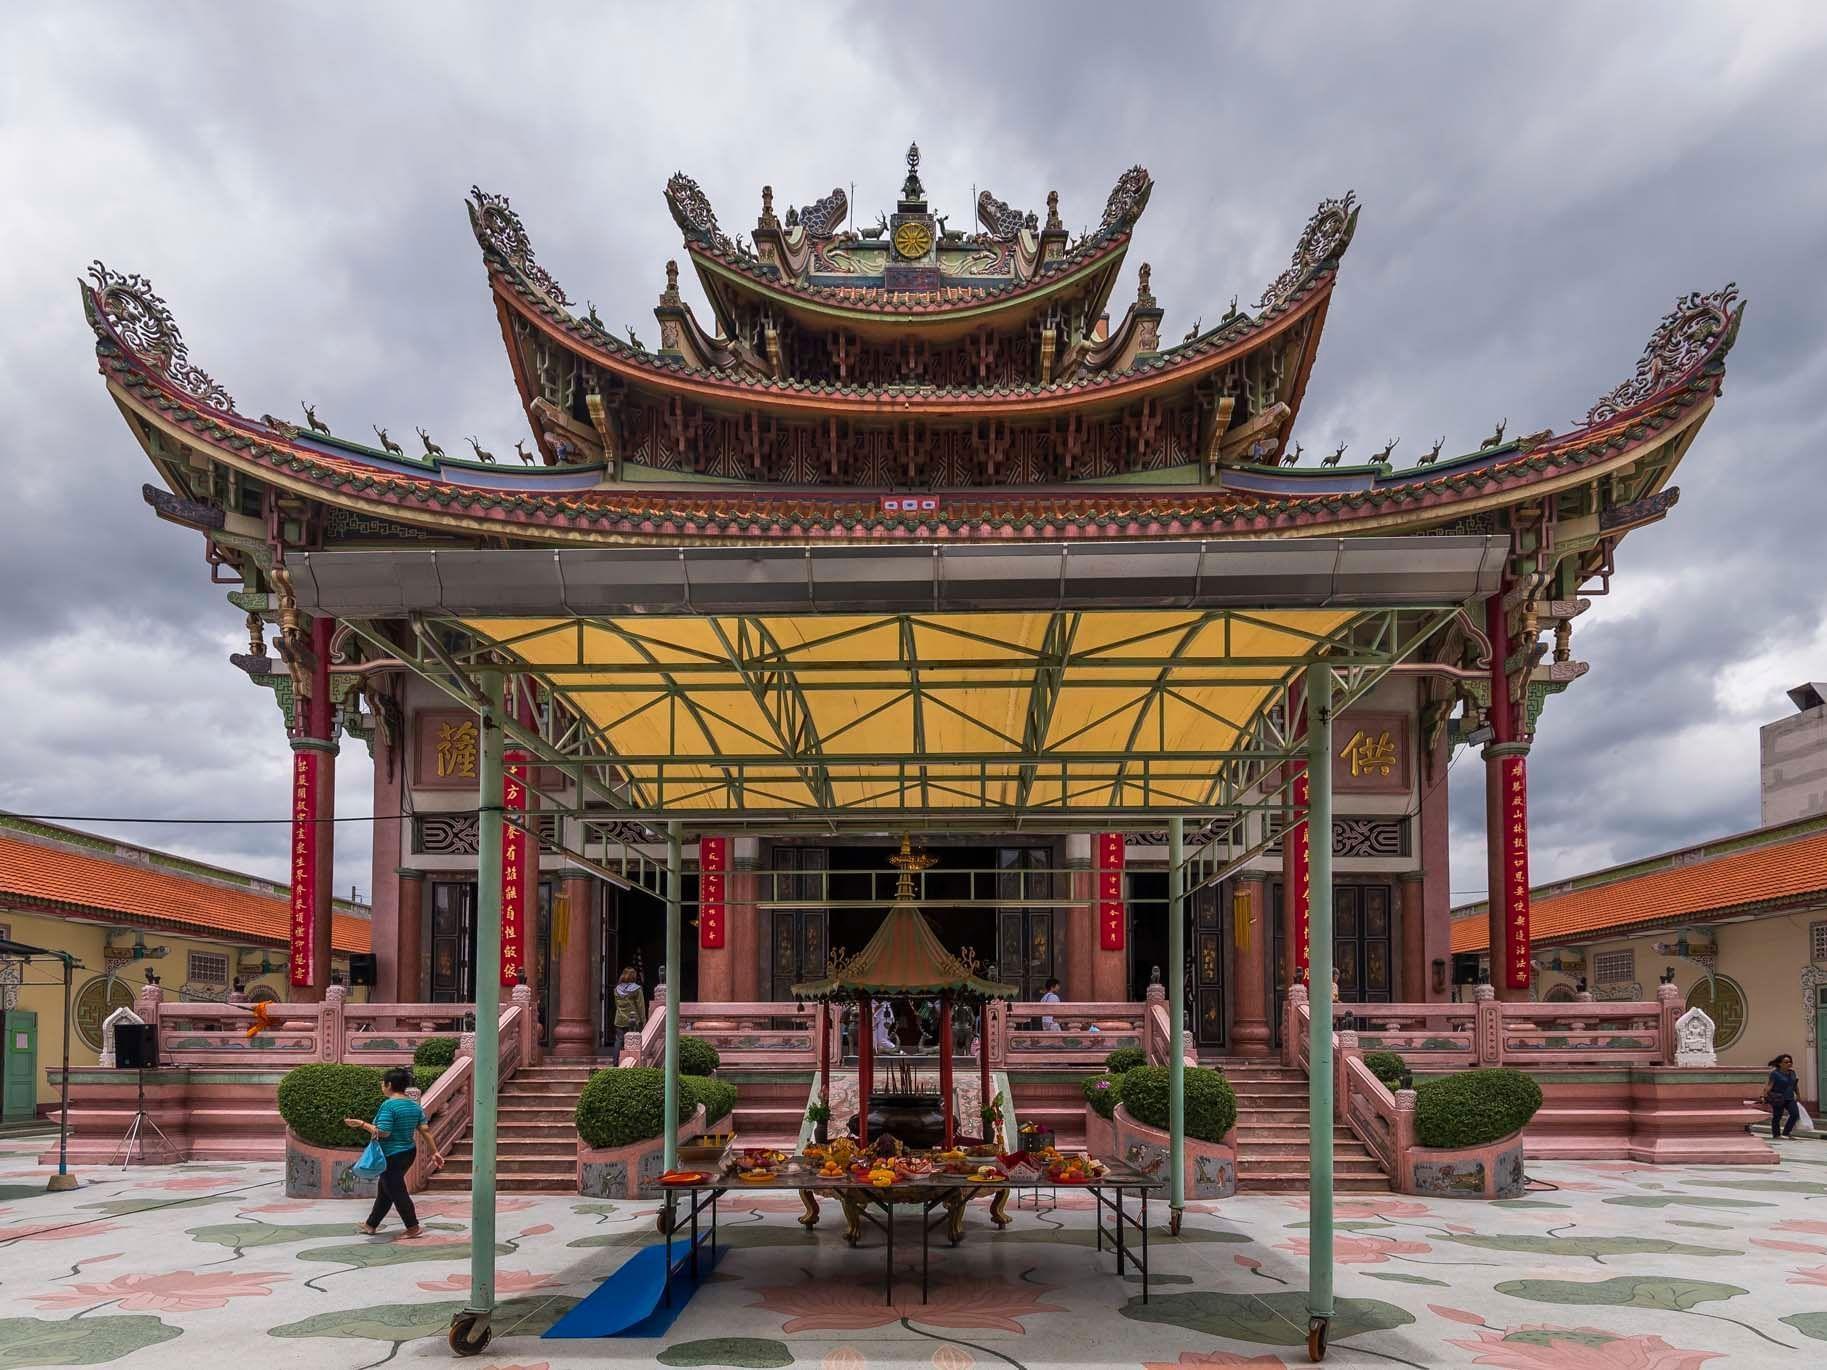 Exterior view of Wat Pho Man Khunaram near Chatrium Hotel Riverside Bangkok